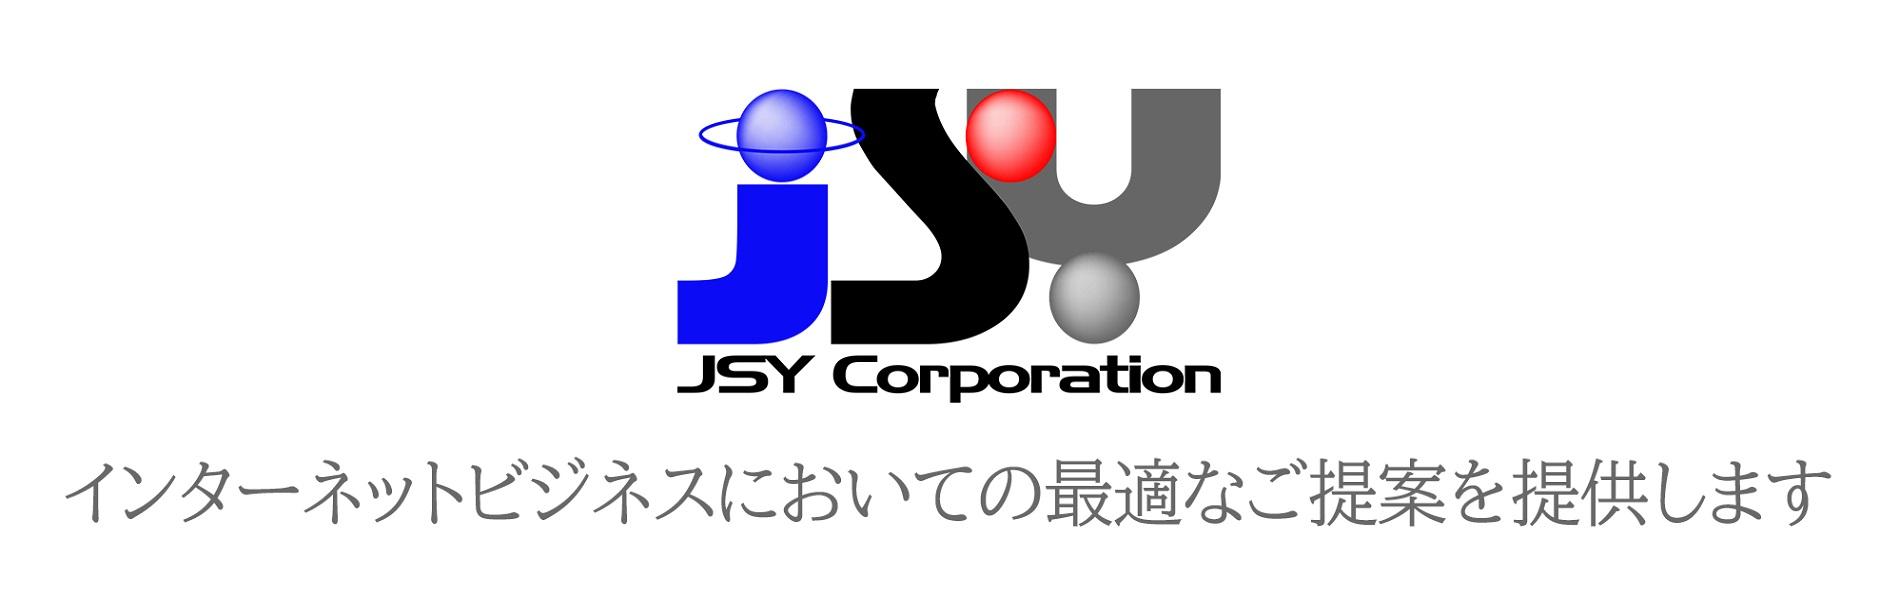 JSY Advertising text